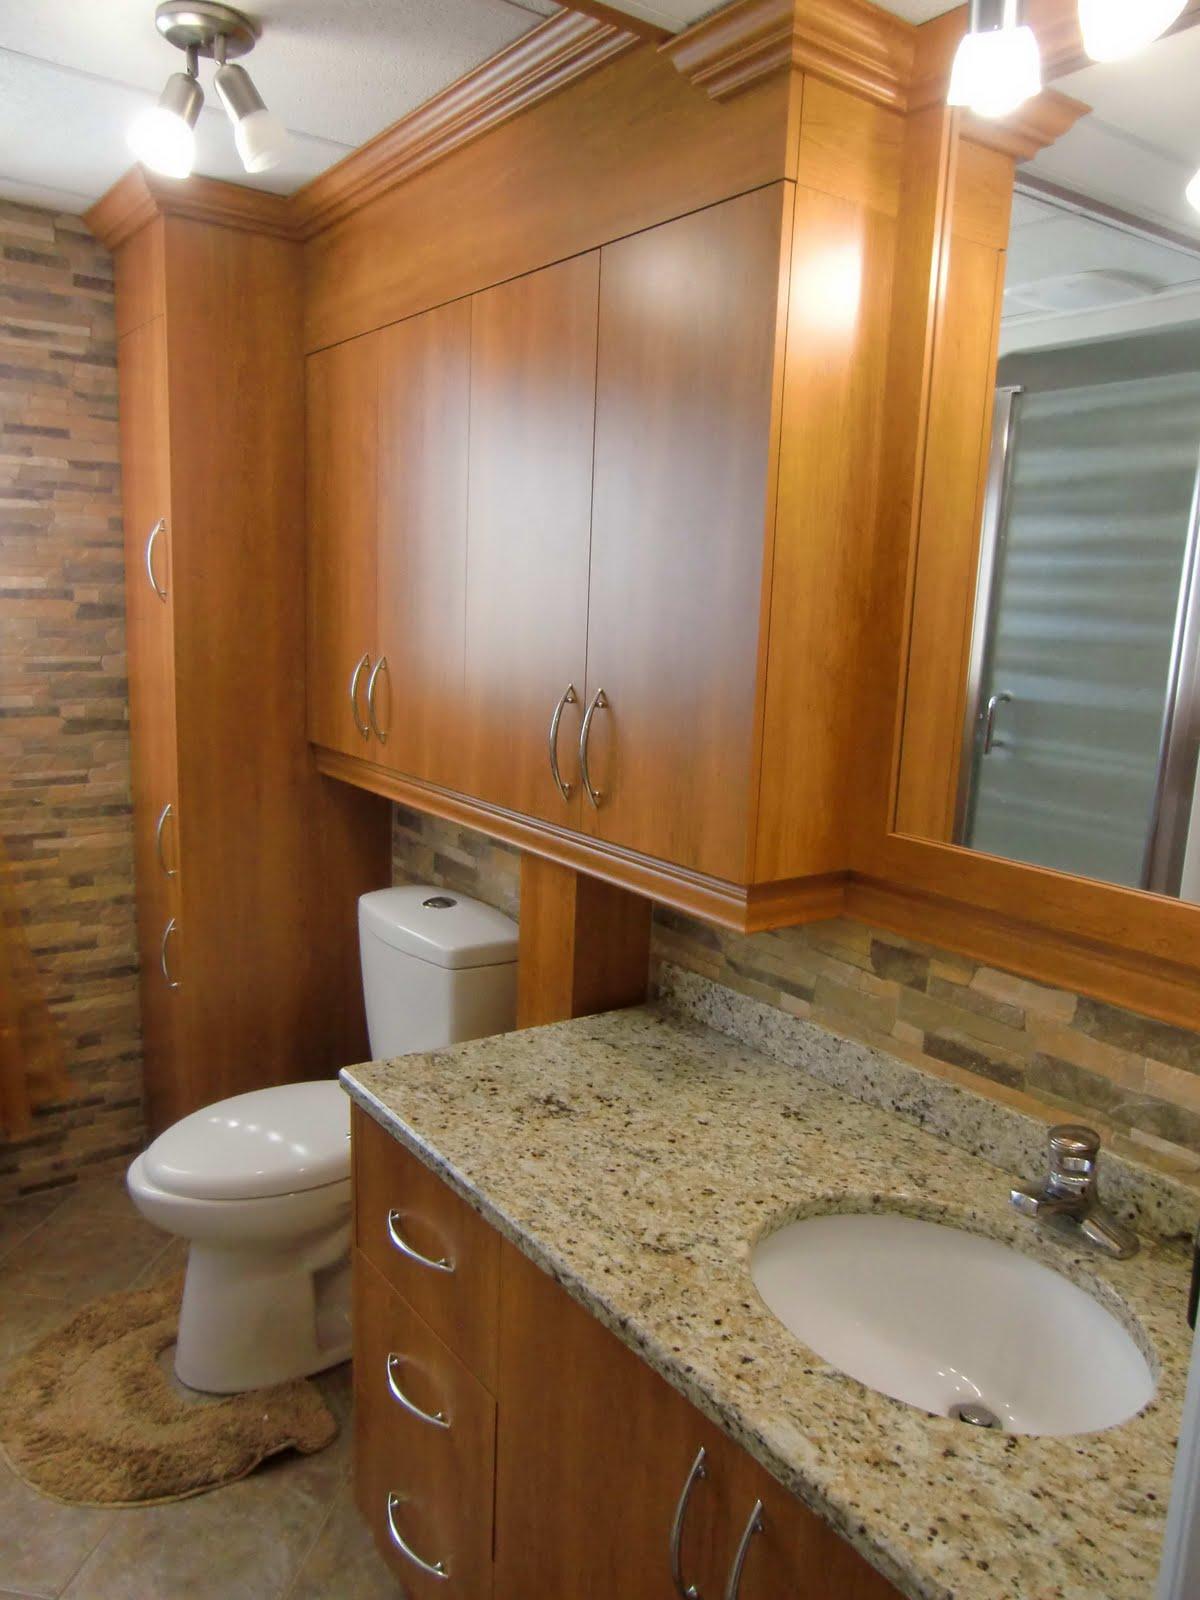 Specialit smm armoire de salle de bain en m lamine for Comptoir de salle de bain